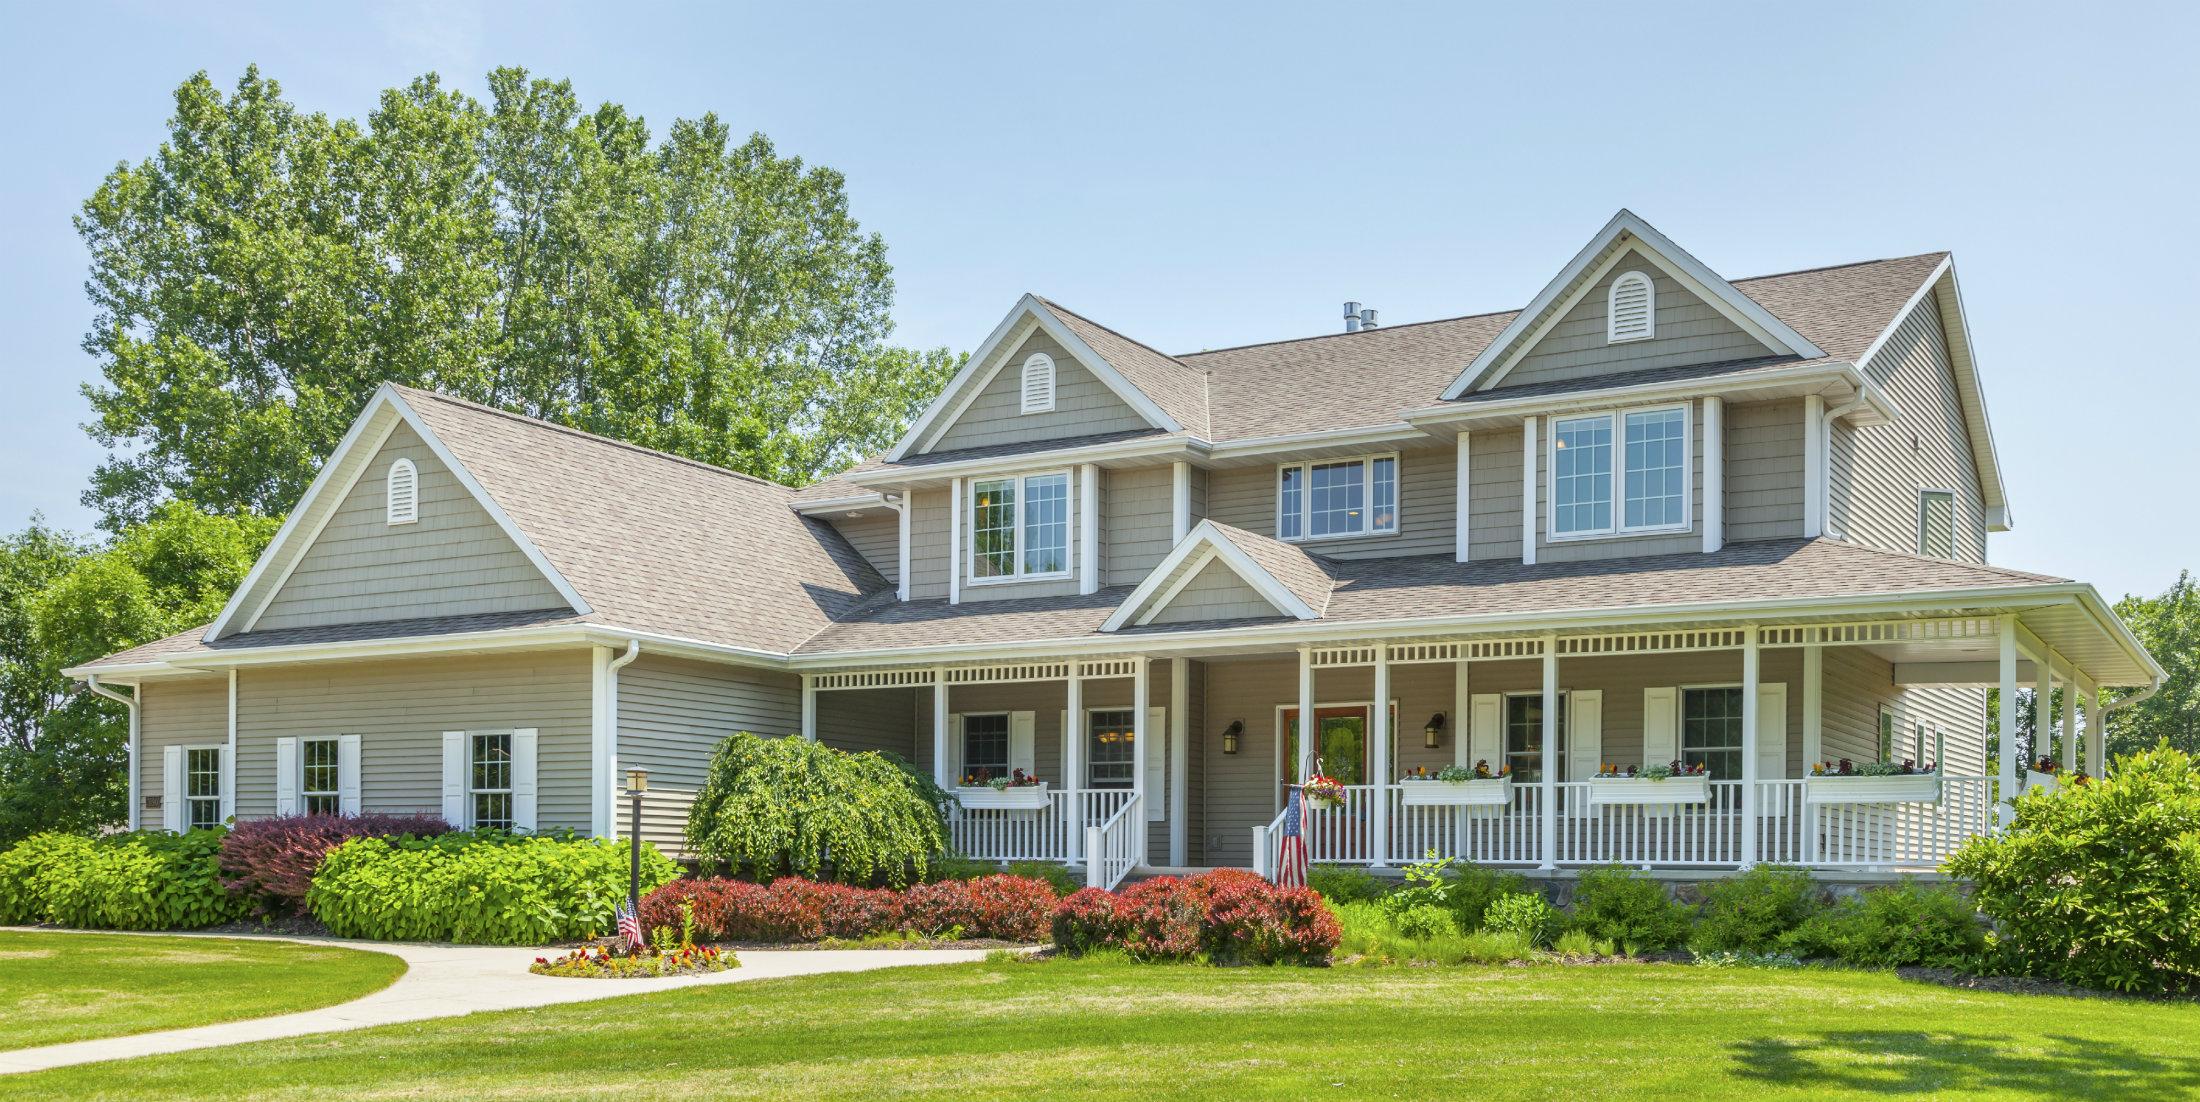 maryland real estate maryland homes for sale